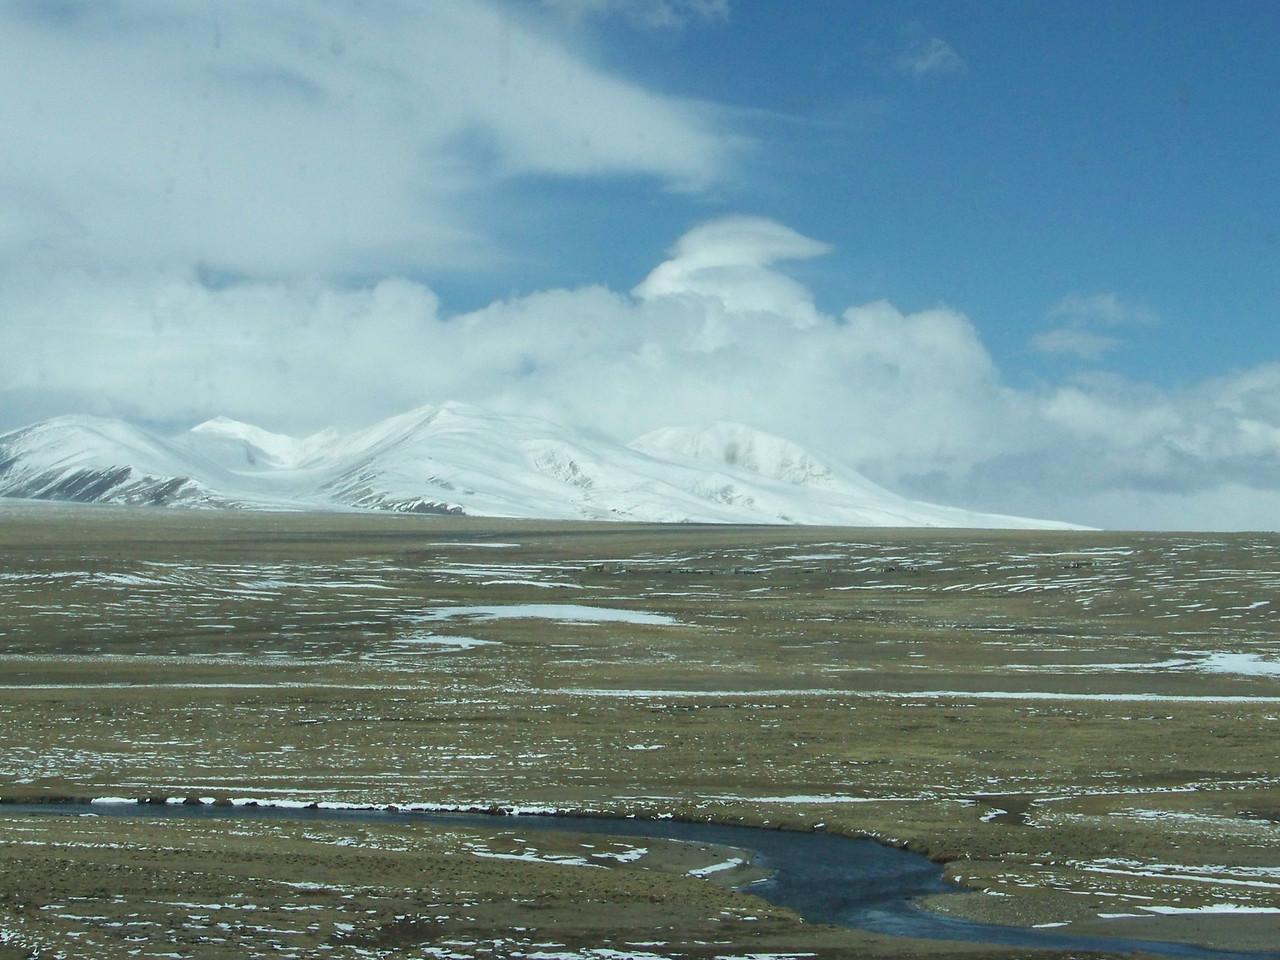 0110 - Scenery on Train Trip Between Beijing and Lhasa.JPG